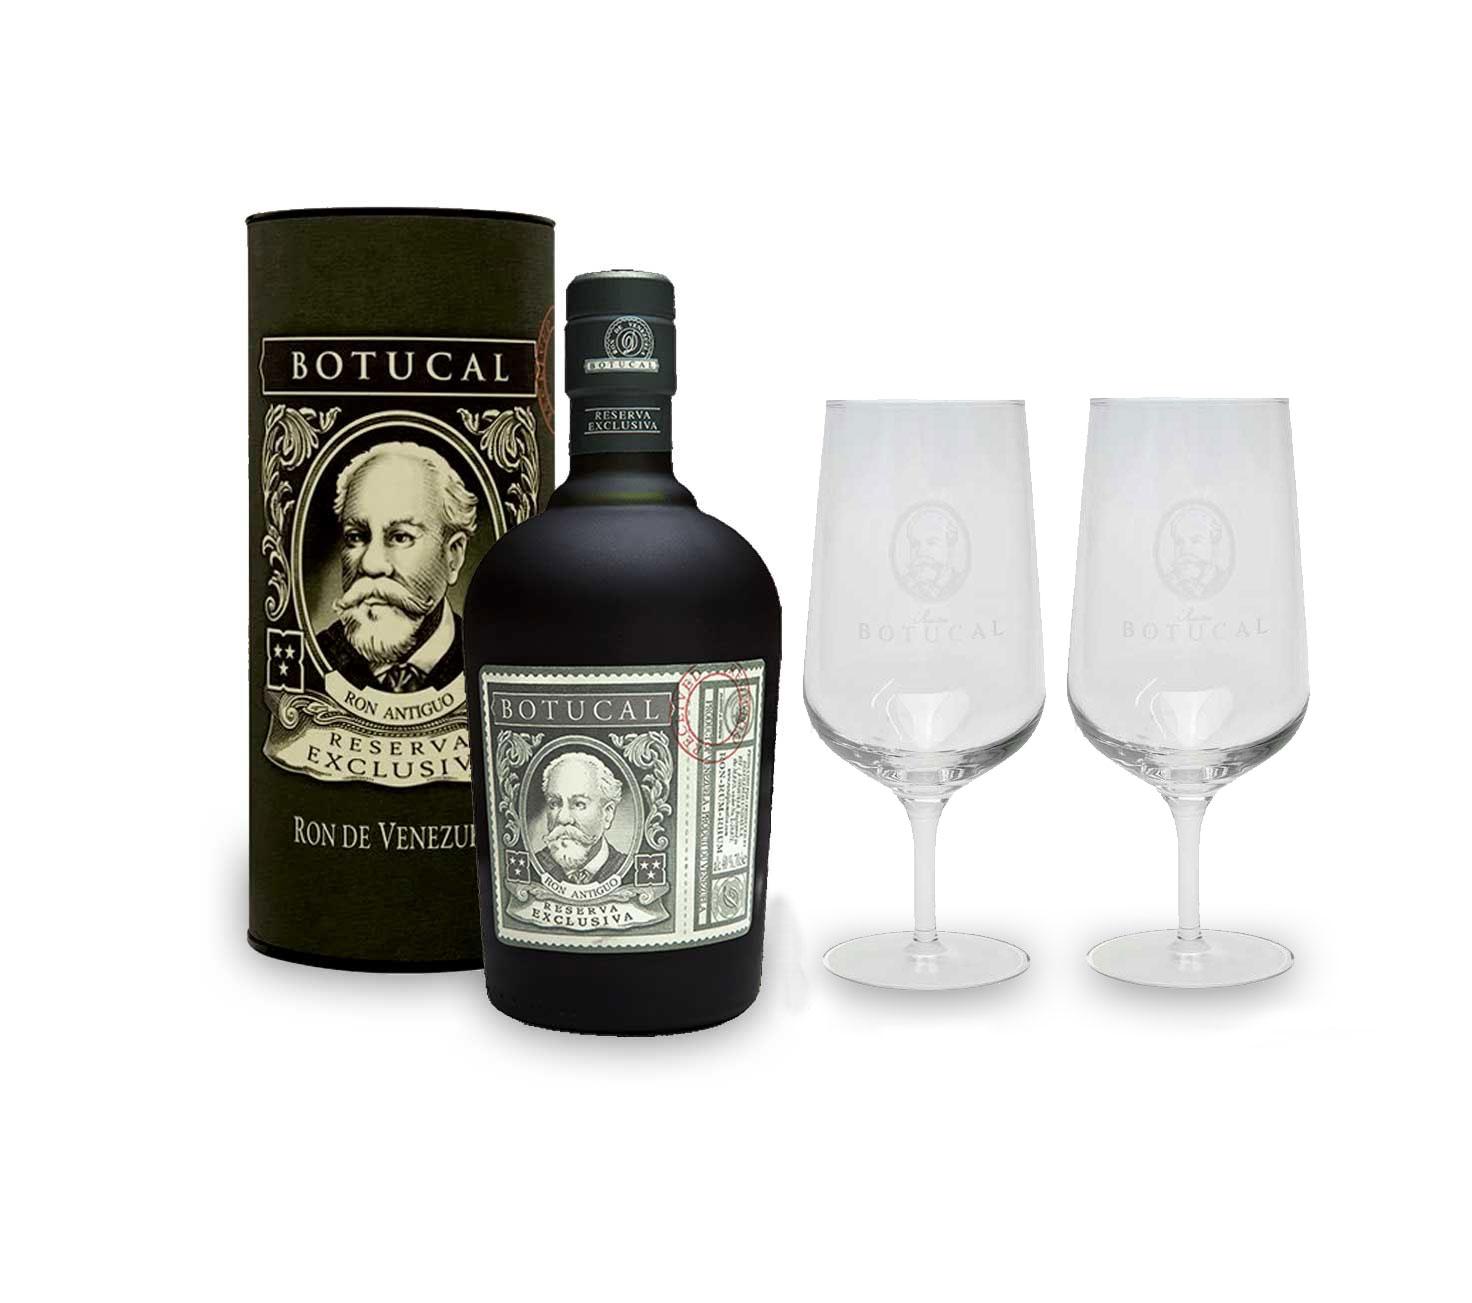 Botucal Reserva Exclusiva Rum mit Geschenkverpackung mit 2 Botucal Nosing Gläser 0,70l (40% Vol) Ron de Venezuela Glas Longdrinkglas - Set - [Enthält Sulfite]